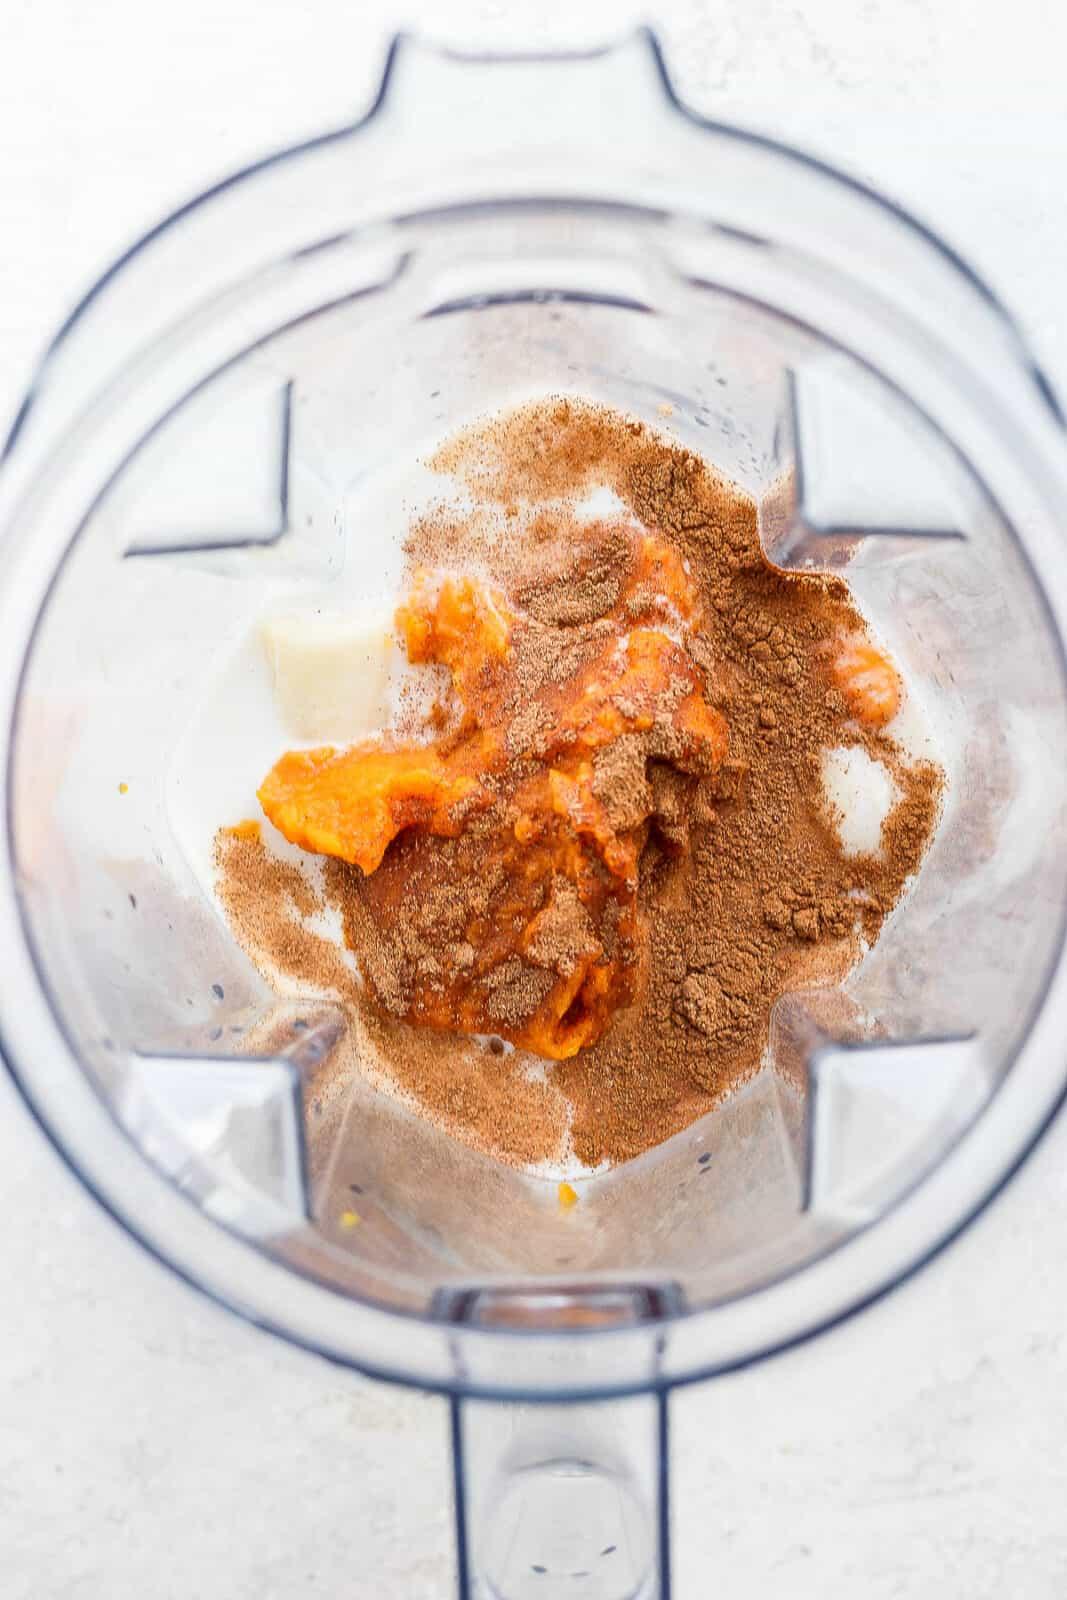 Pumpkin smoothie ingredients in a blender.